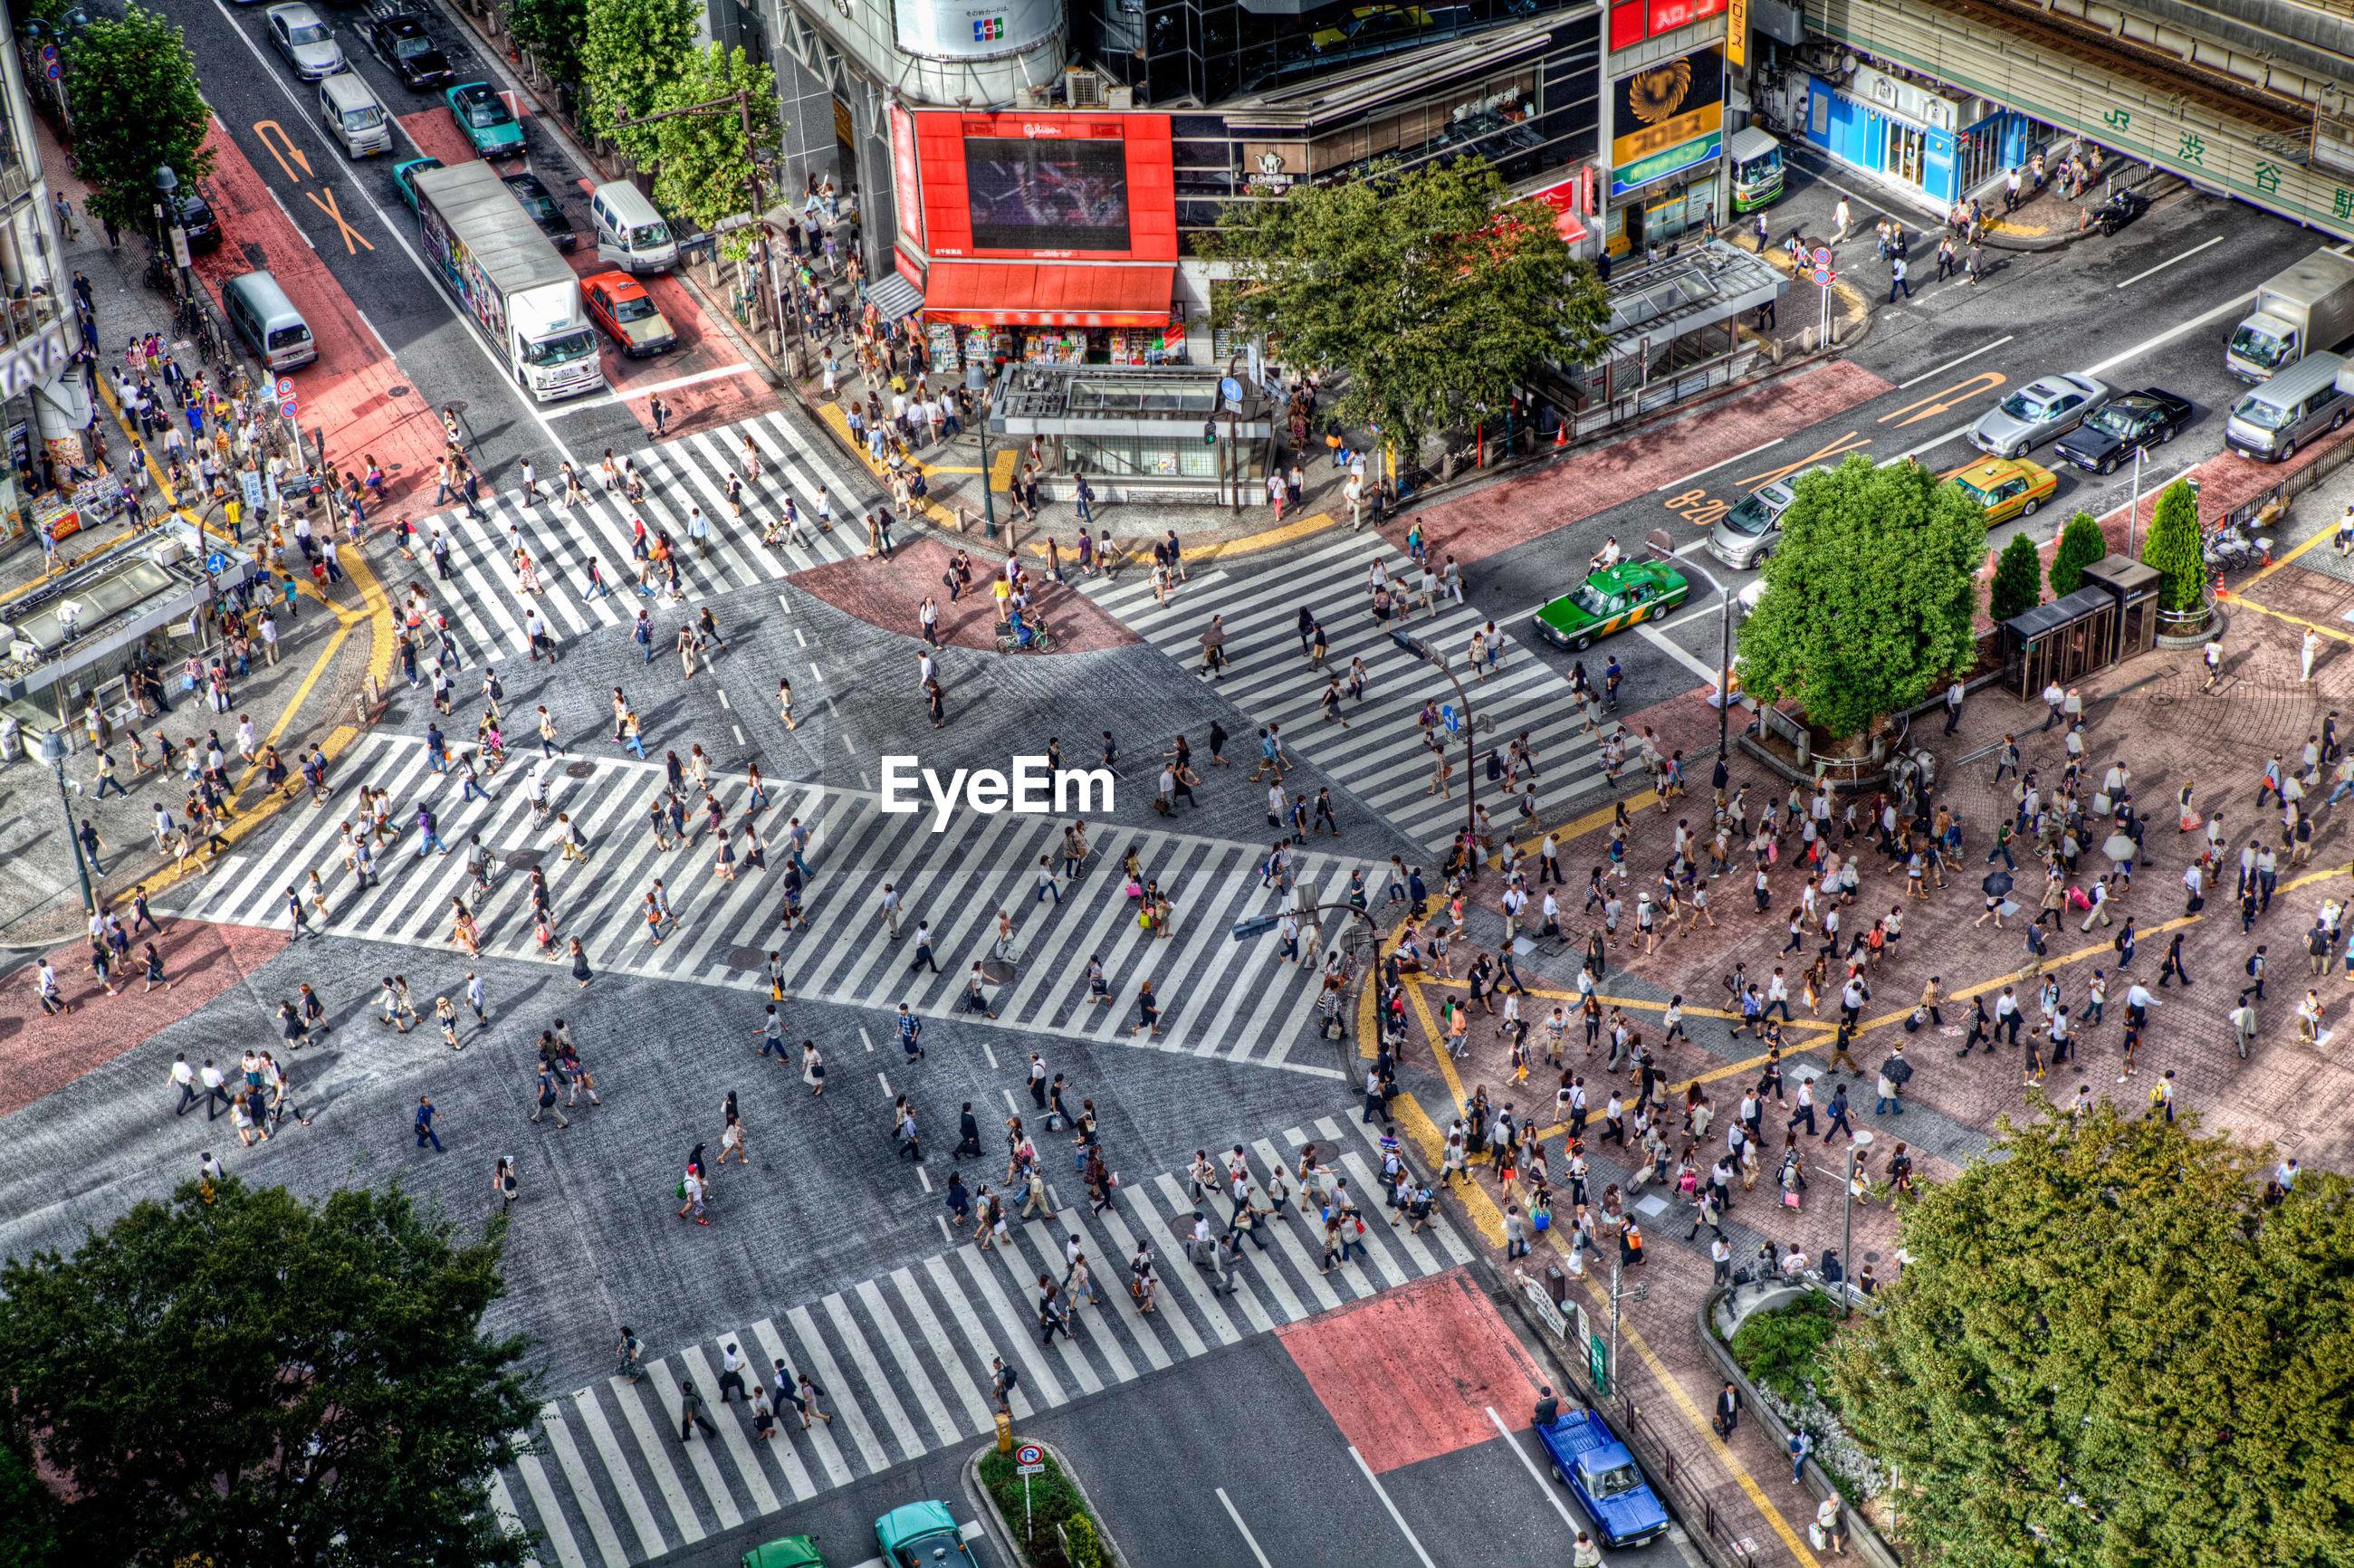 Aerial view of pedestrians crossing road